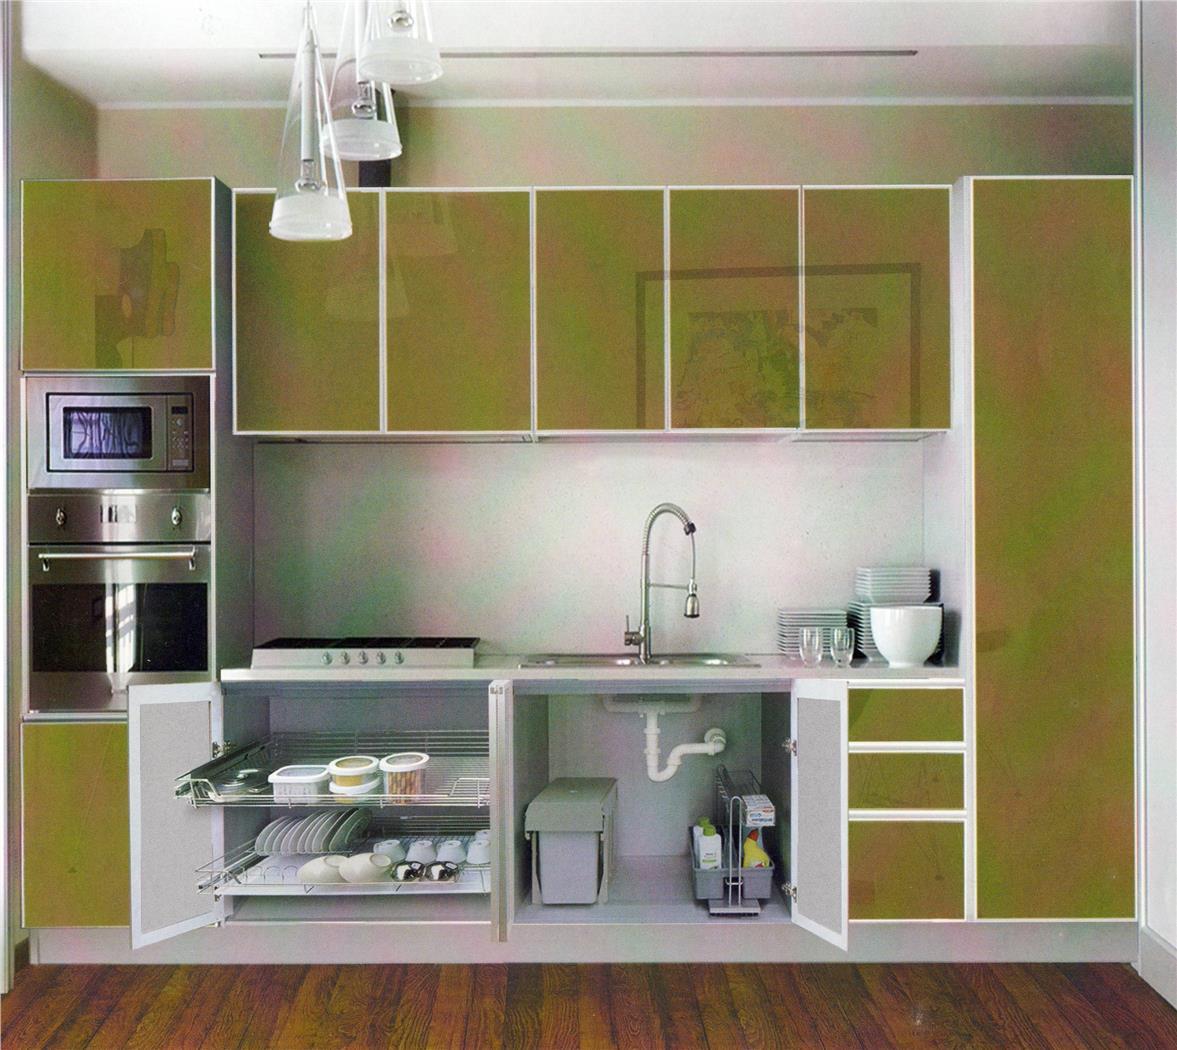 Kitchen Cabinet Selangor Kitchen Cabinet In Rawang: Kitchen Cabi (Selangor) End Time 4/25/2020 3:15 PM Lelong.my